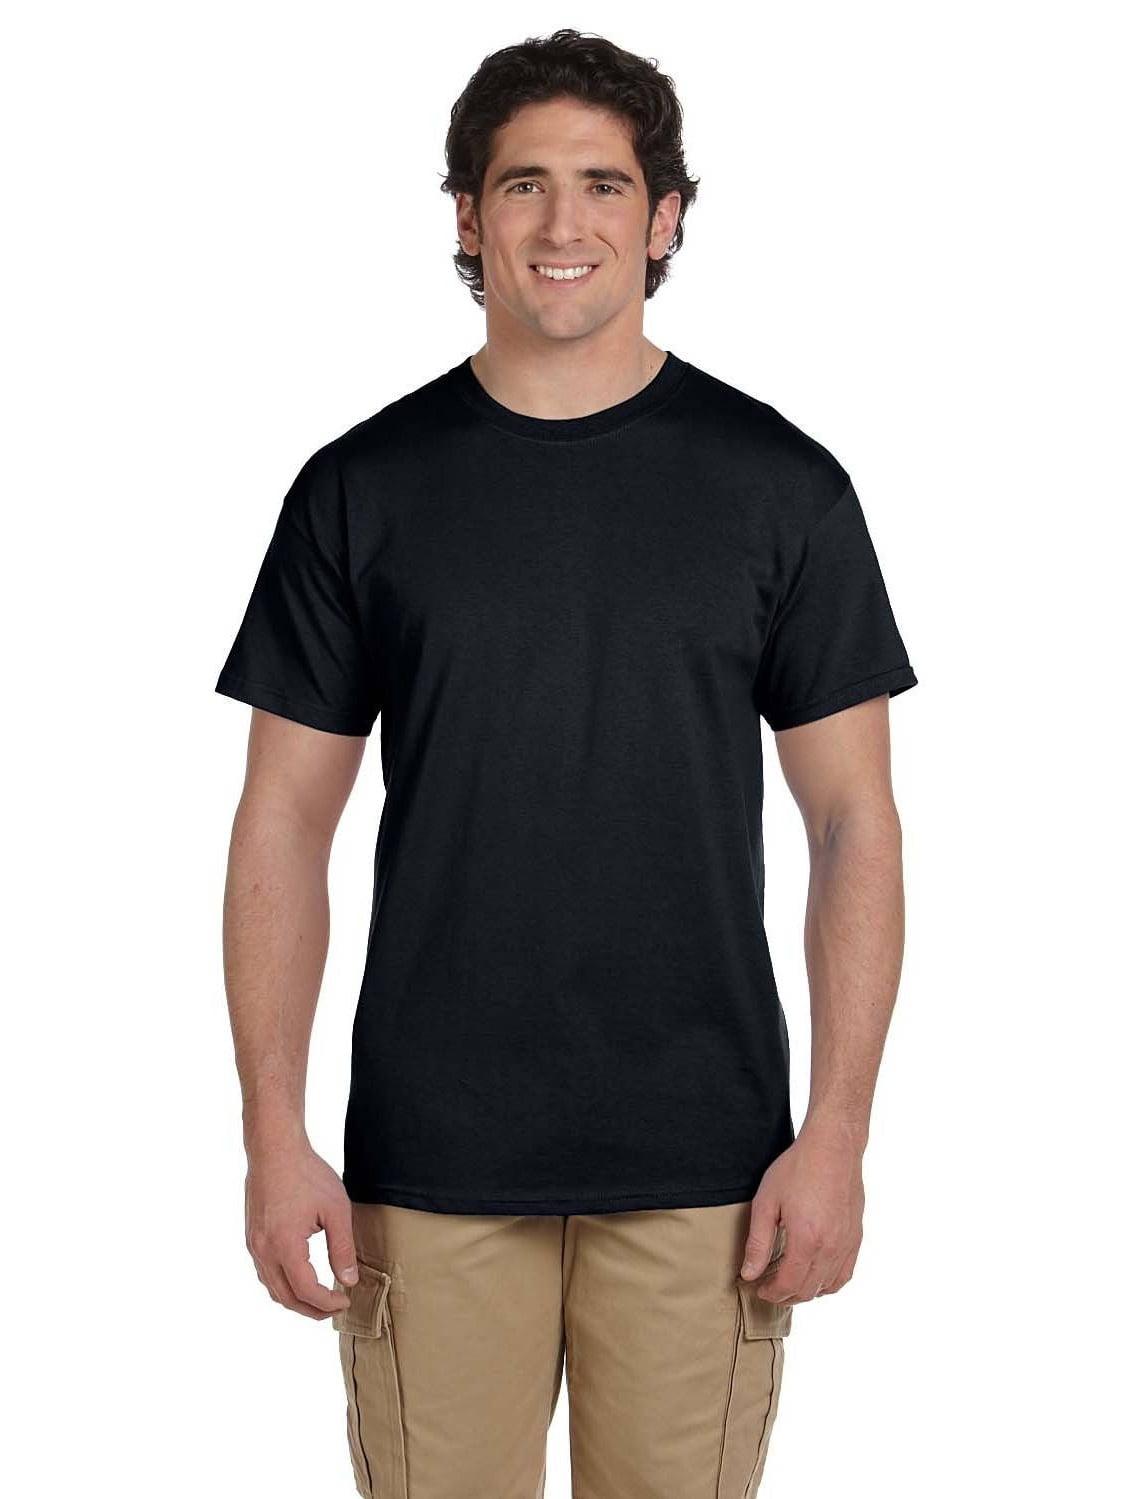 Gildan  Men's Black Ultra Cotton Undershirts (Pack of 9)